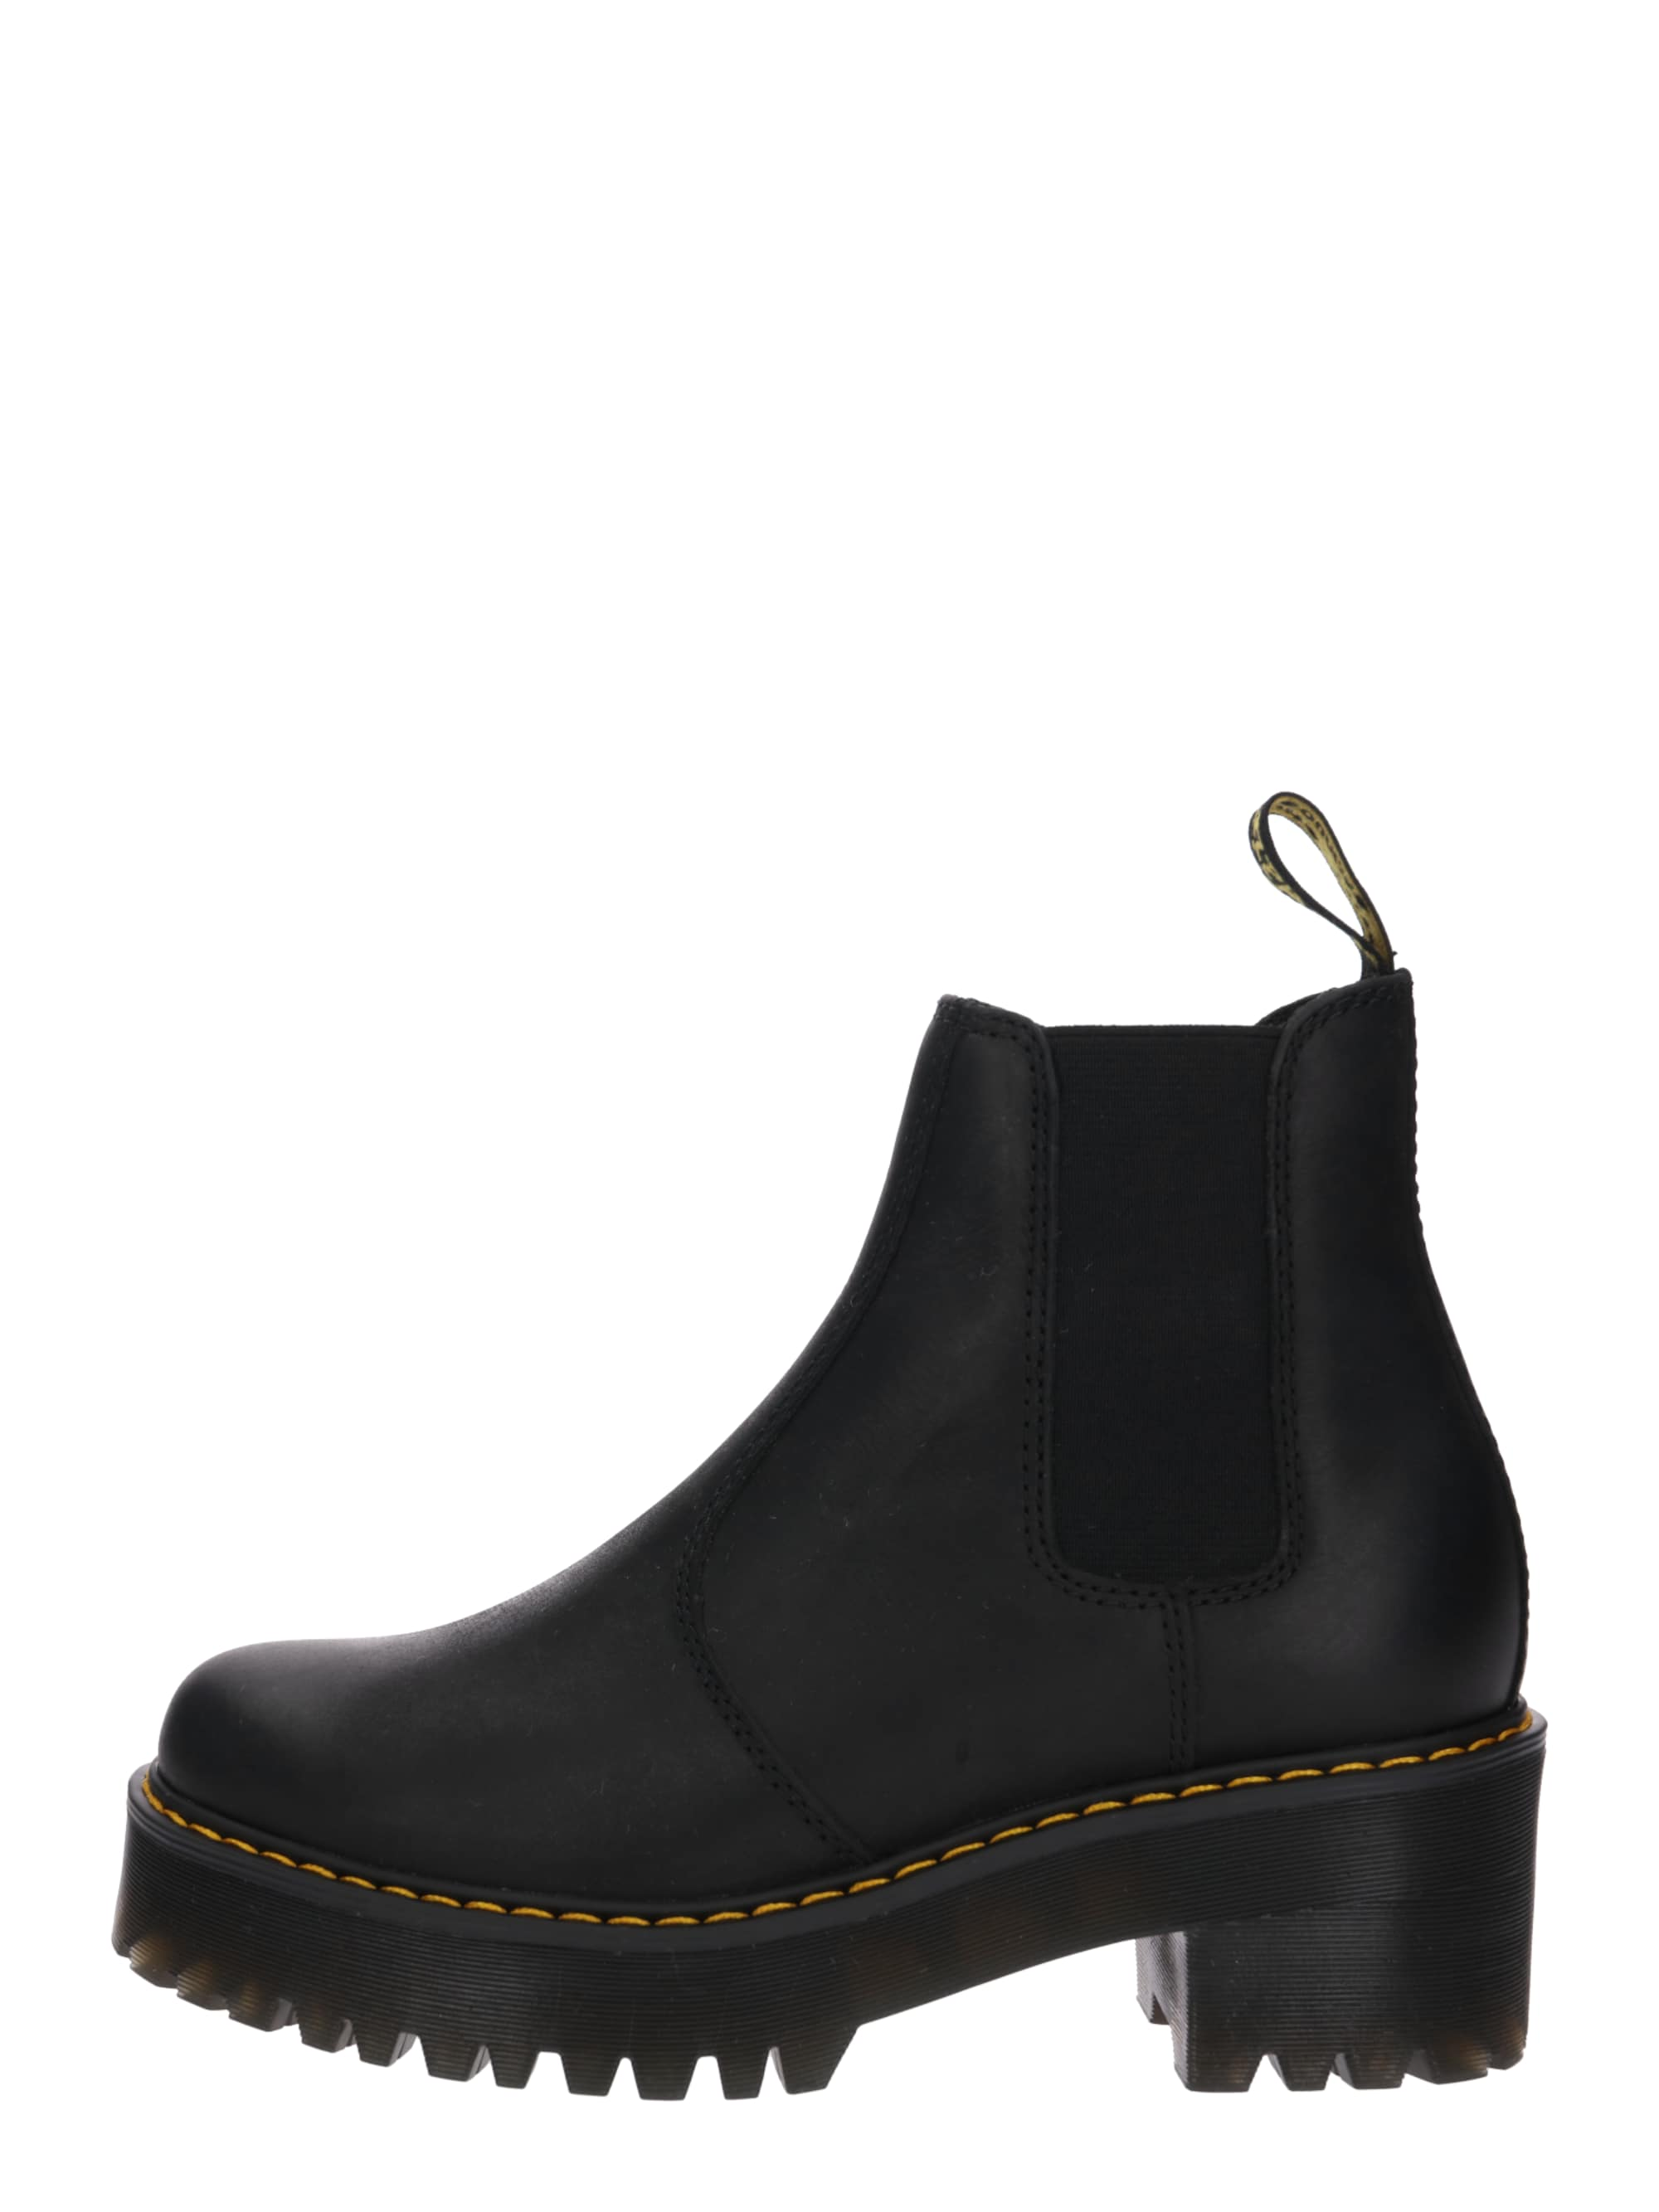 Chelsea boots 'Rometty'